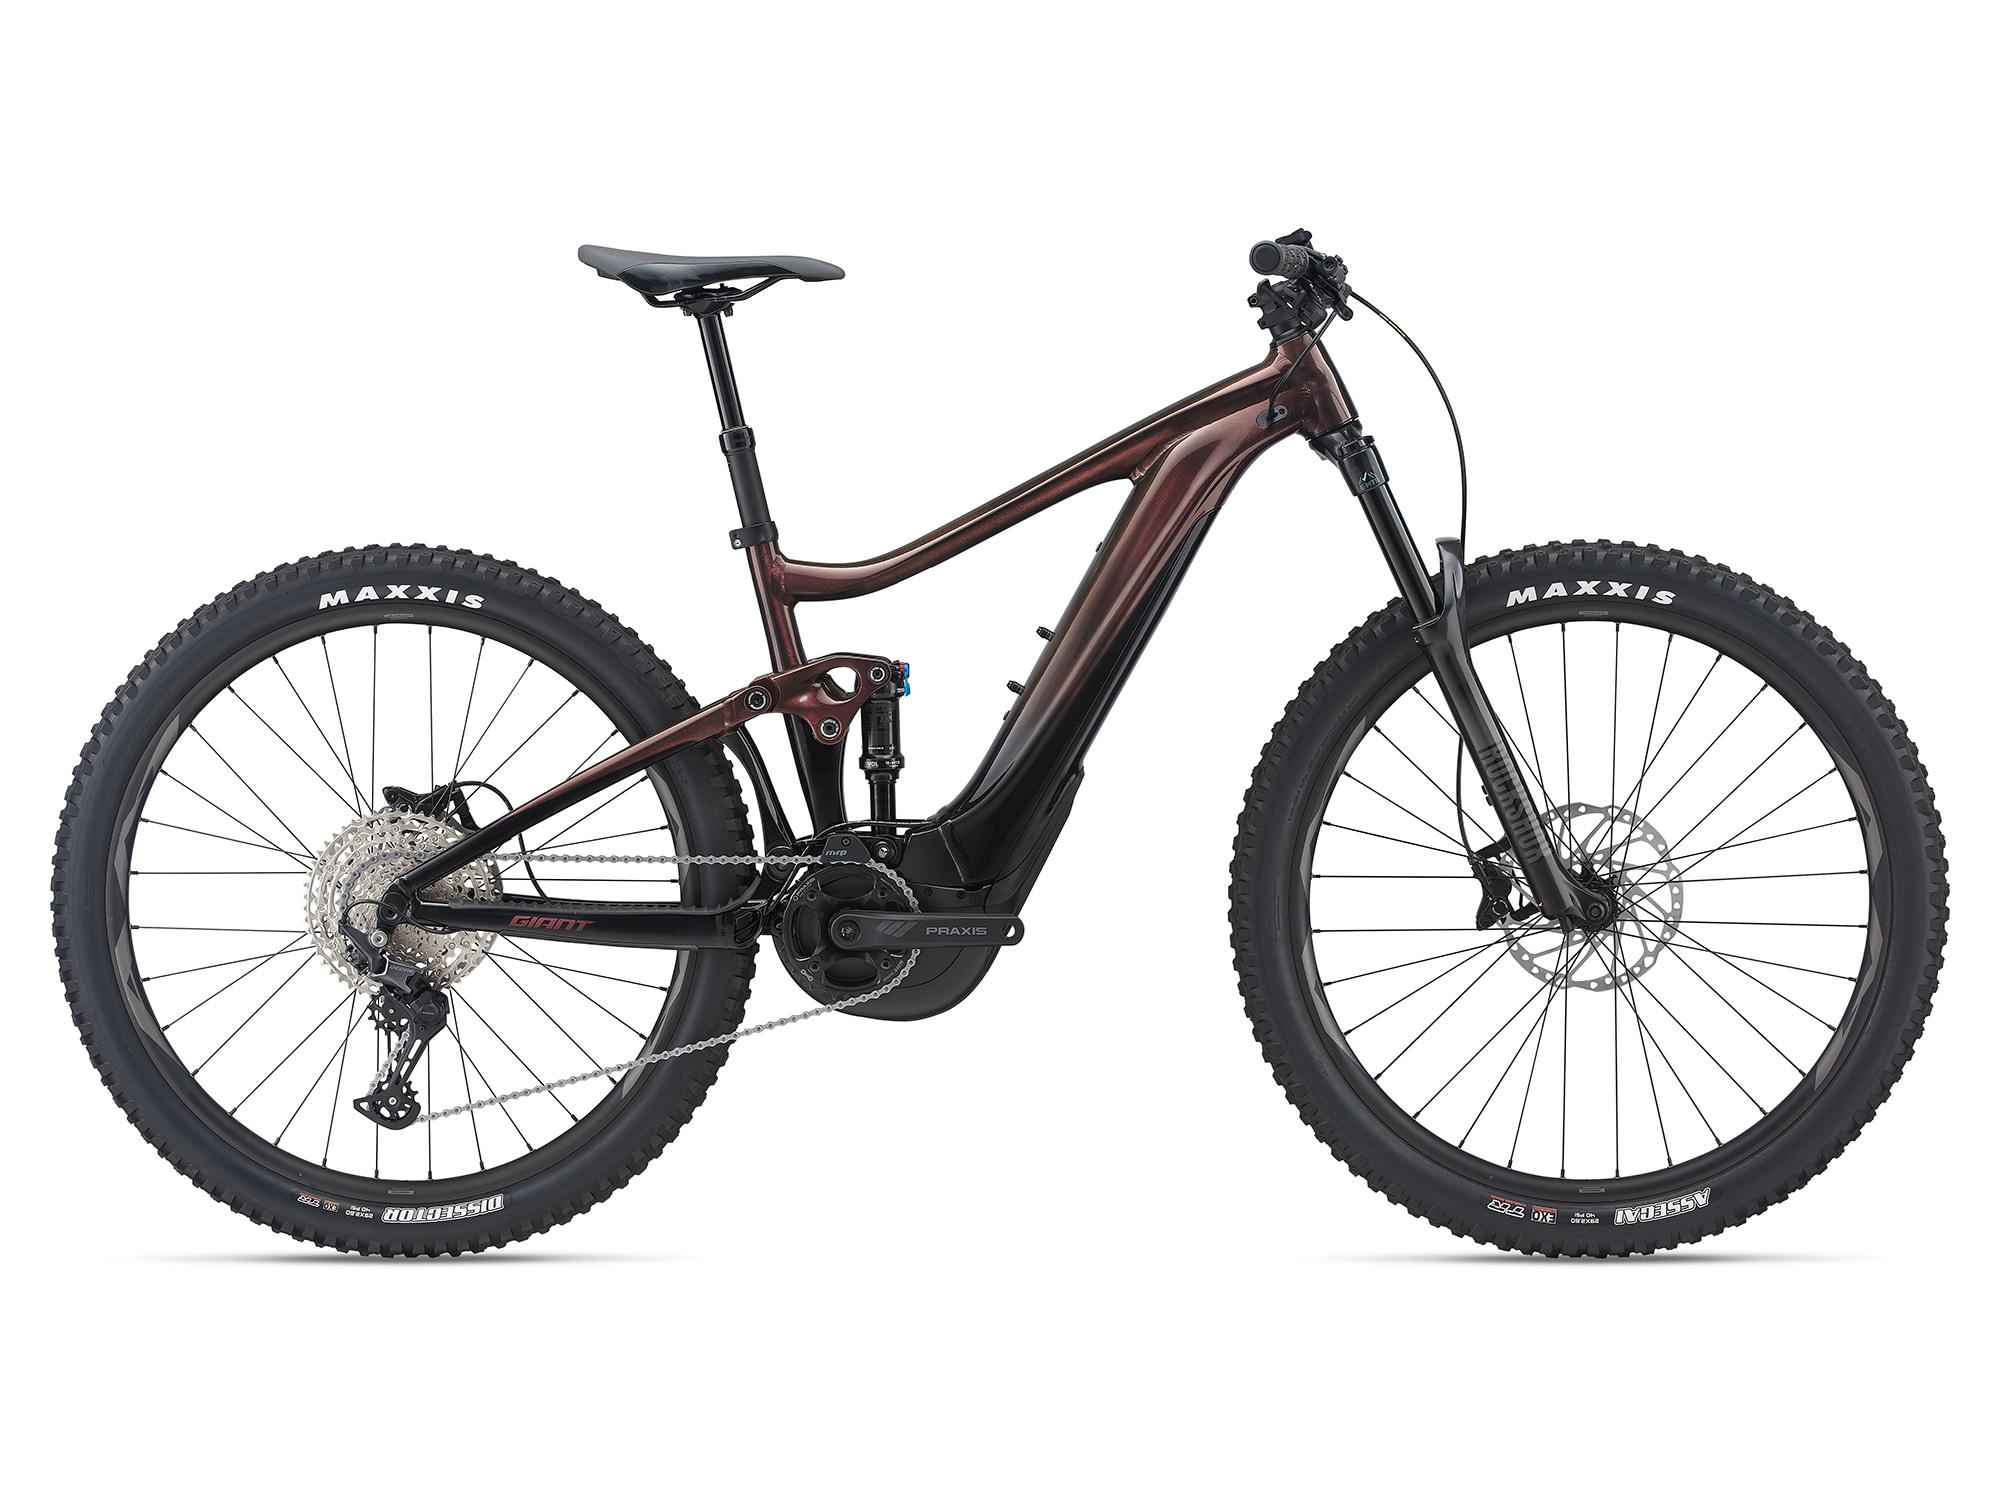 Giant E-Fullsuspension-Bikes